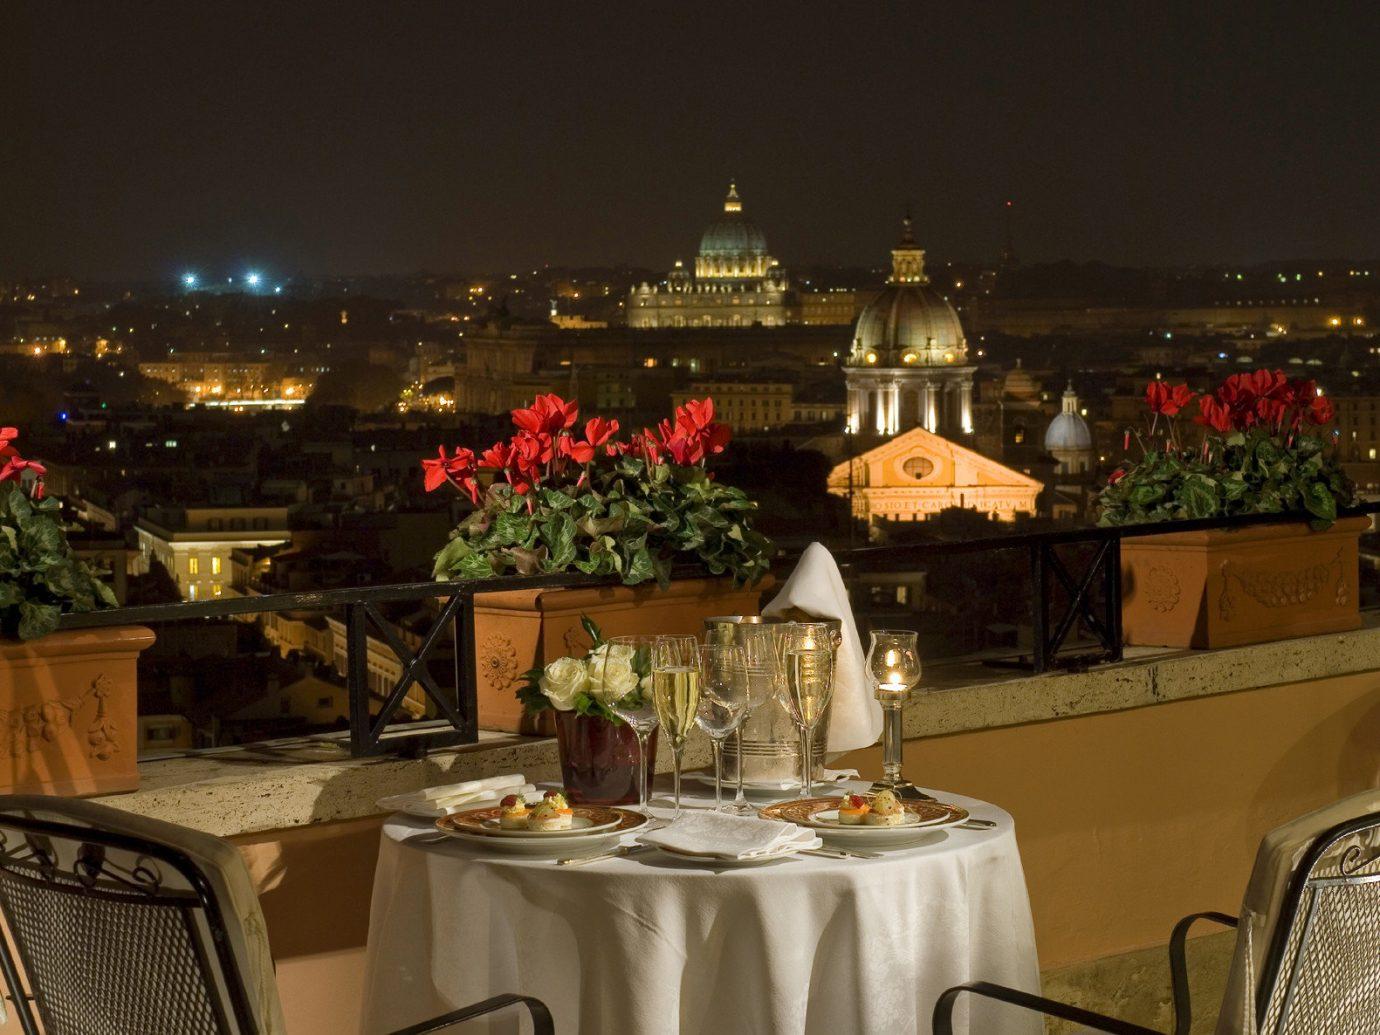 Hotels meal restaurant